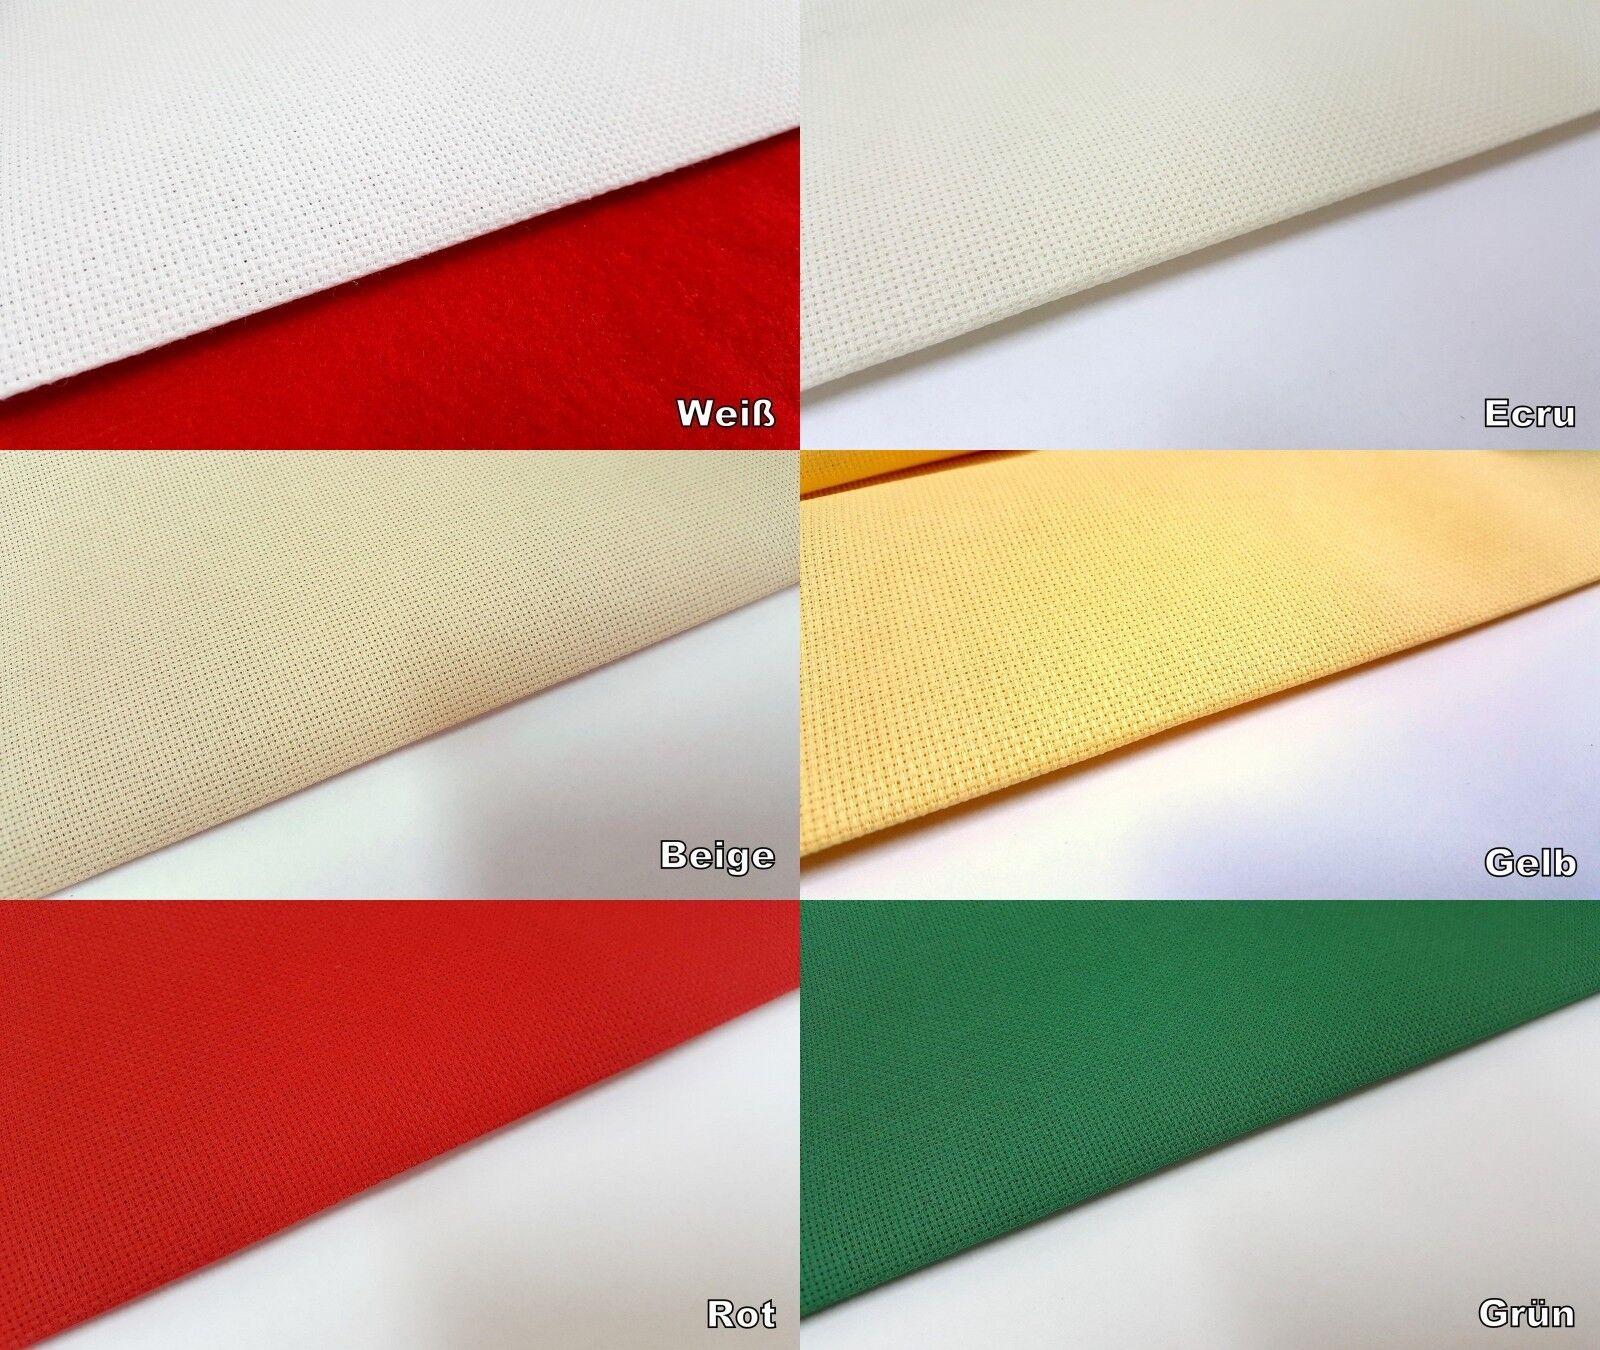 Aida Stickstoff 7,0 Stiche/cm 160 cm breit Meterware 19,75 €/m